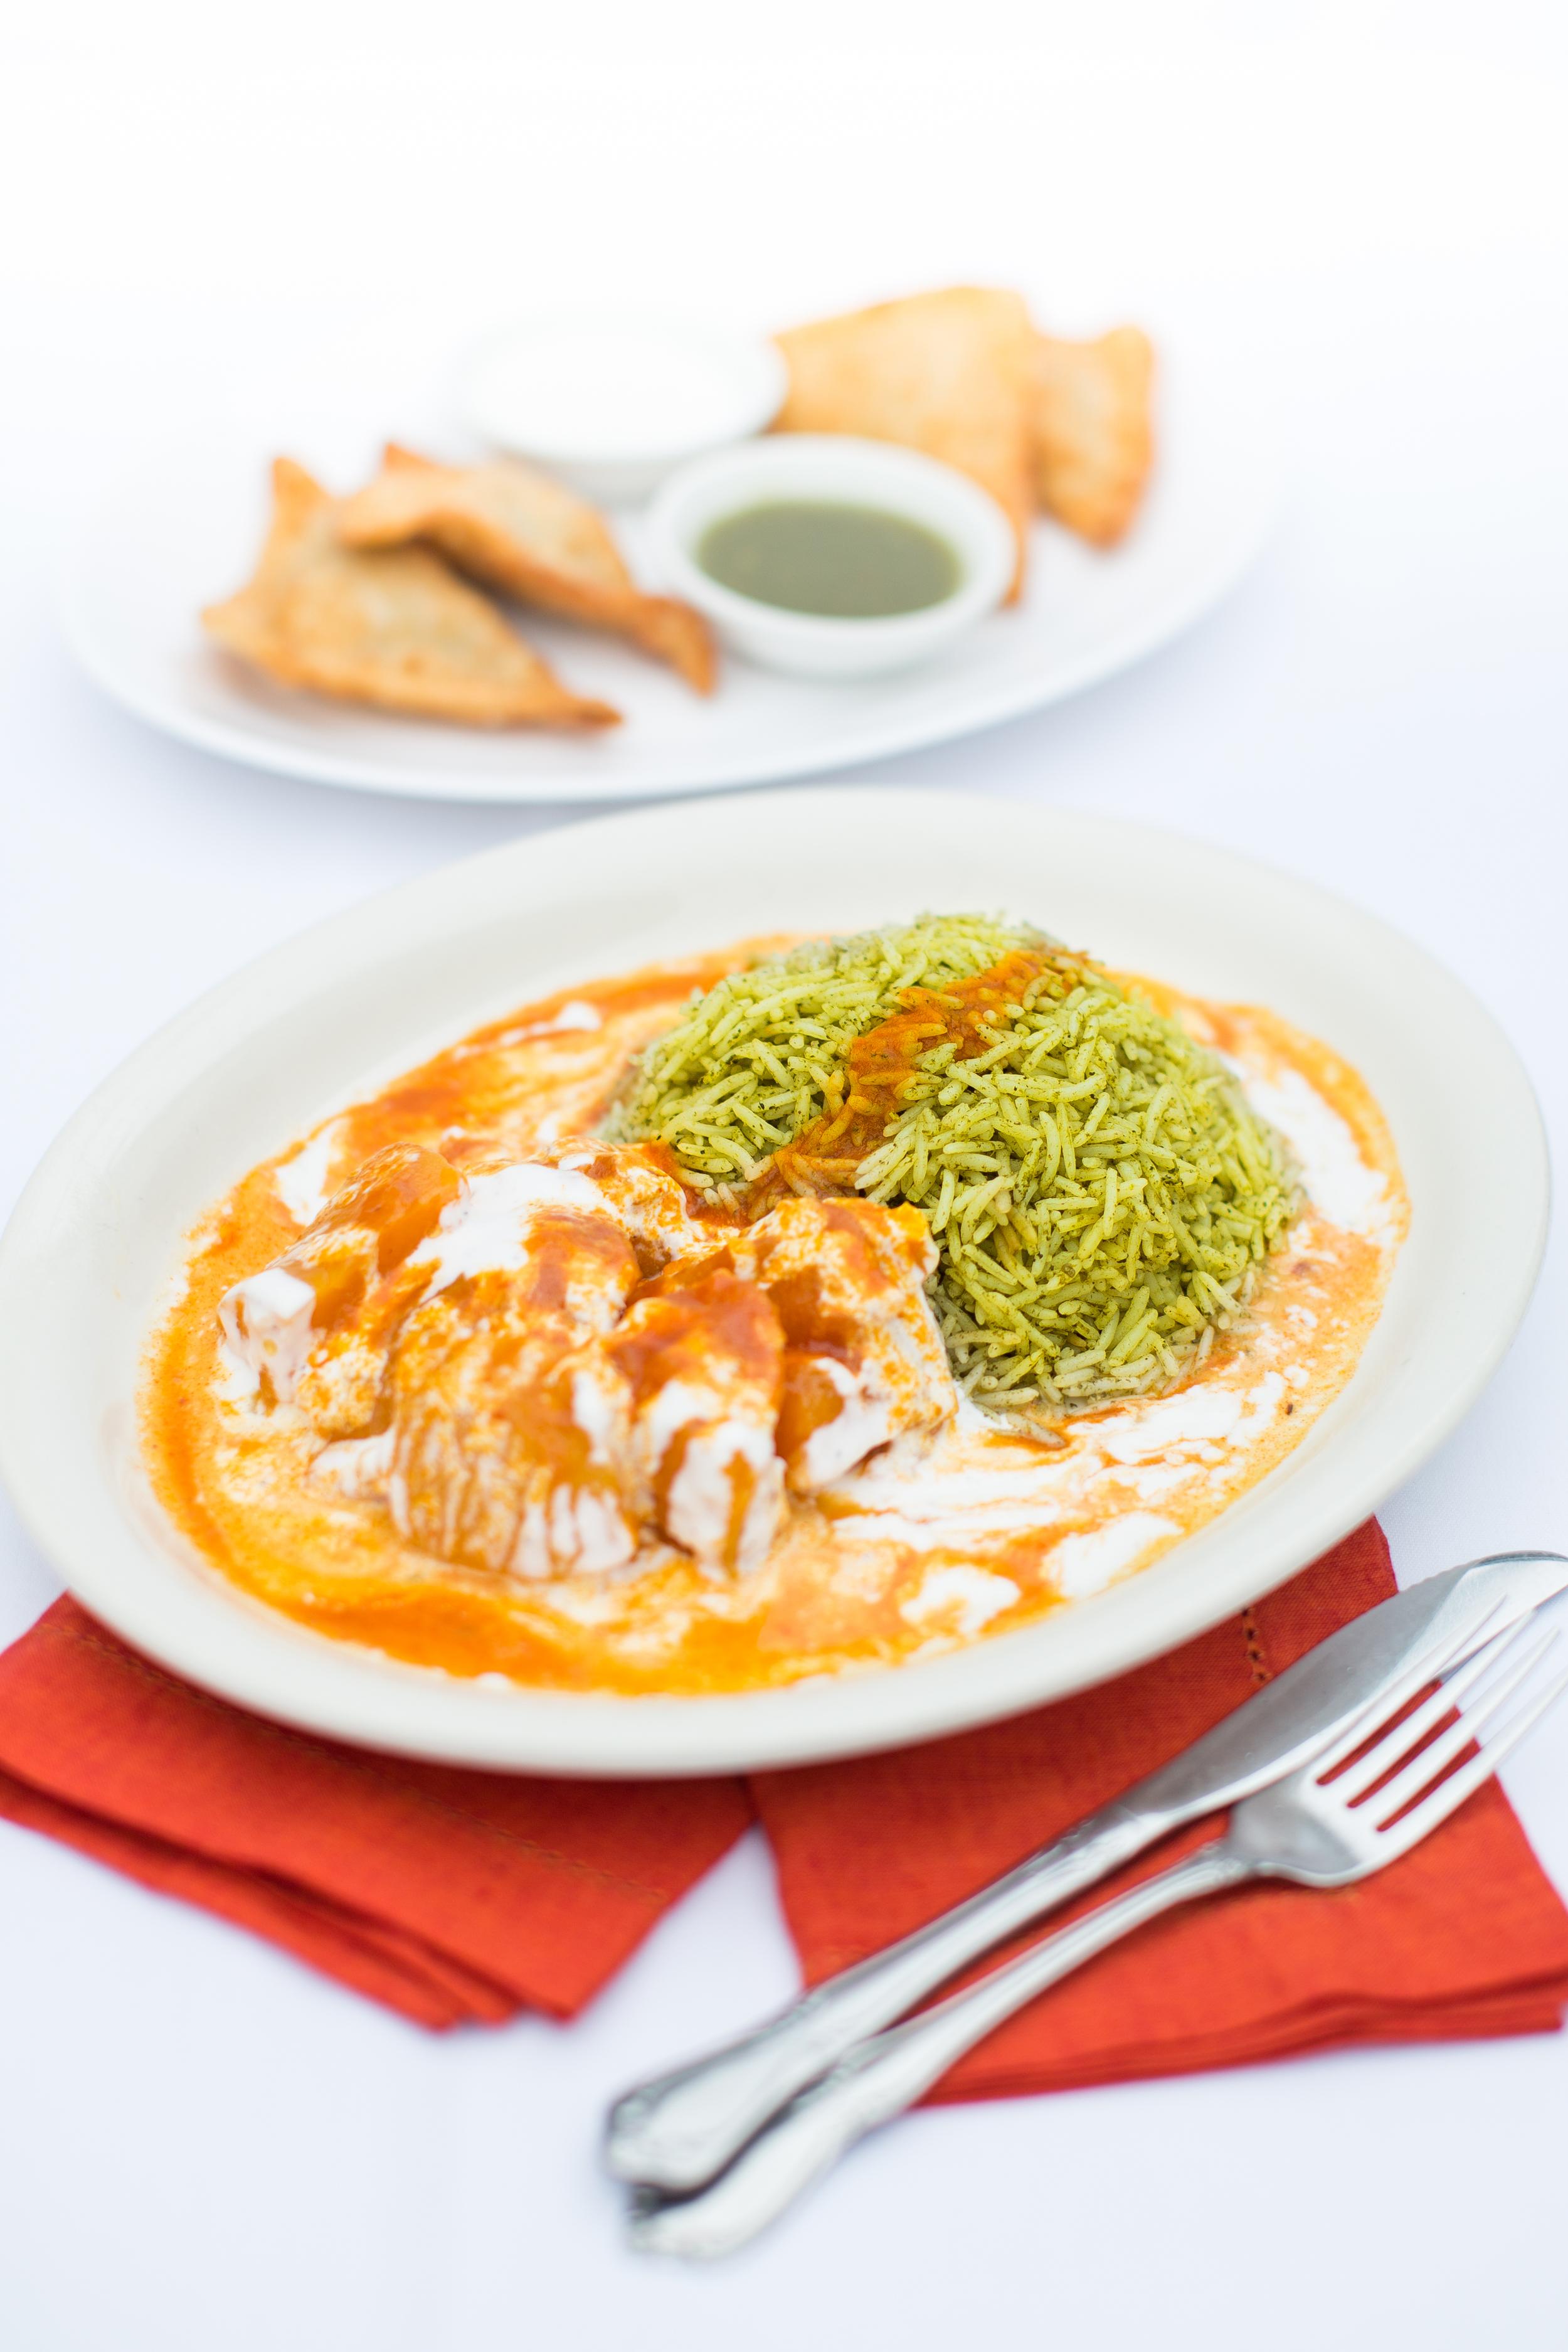 Panjshir-Cam-2-vertical-4-nabu-food-photography.jpg